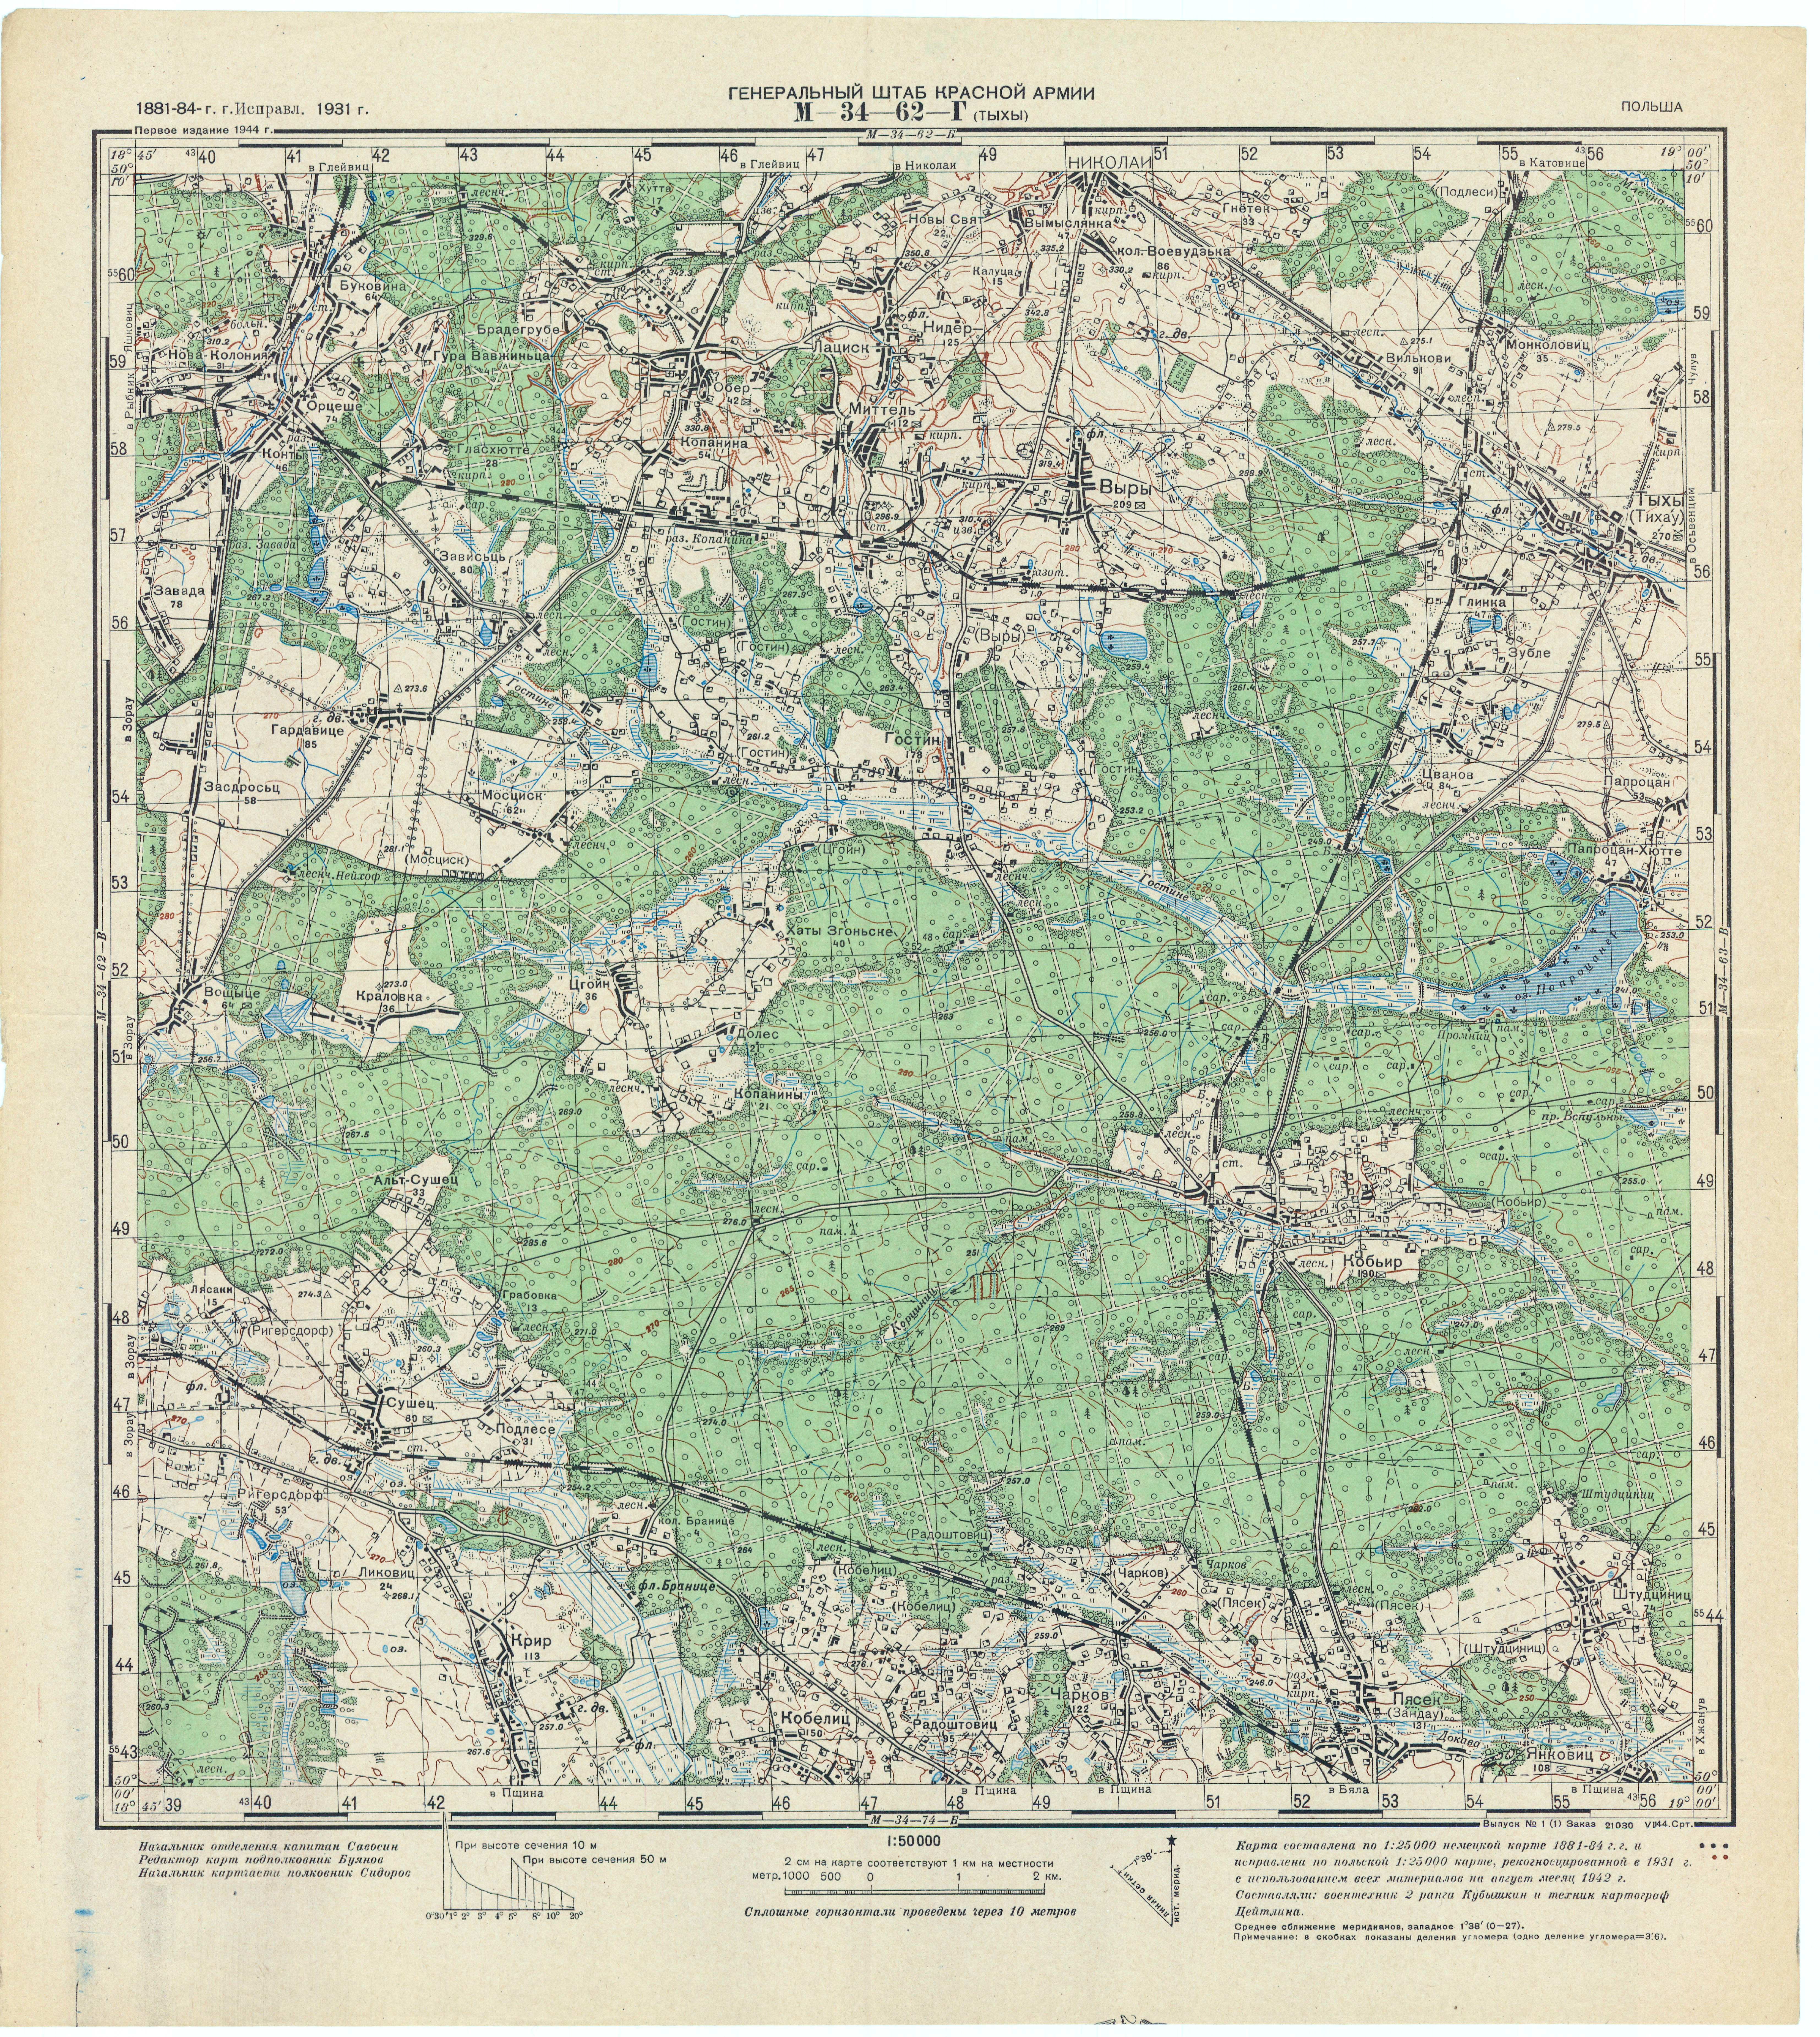 Mapy I Plany Tychy 1944 Rok Stare Zdjecia